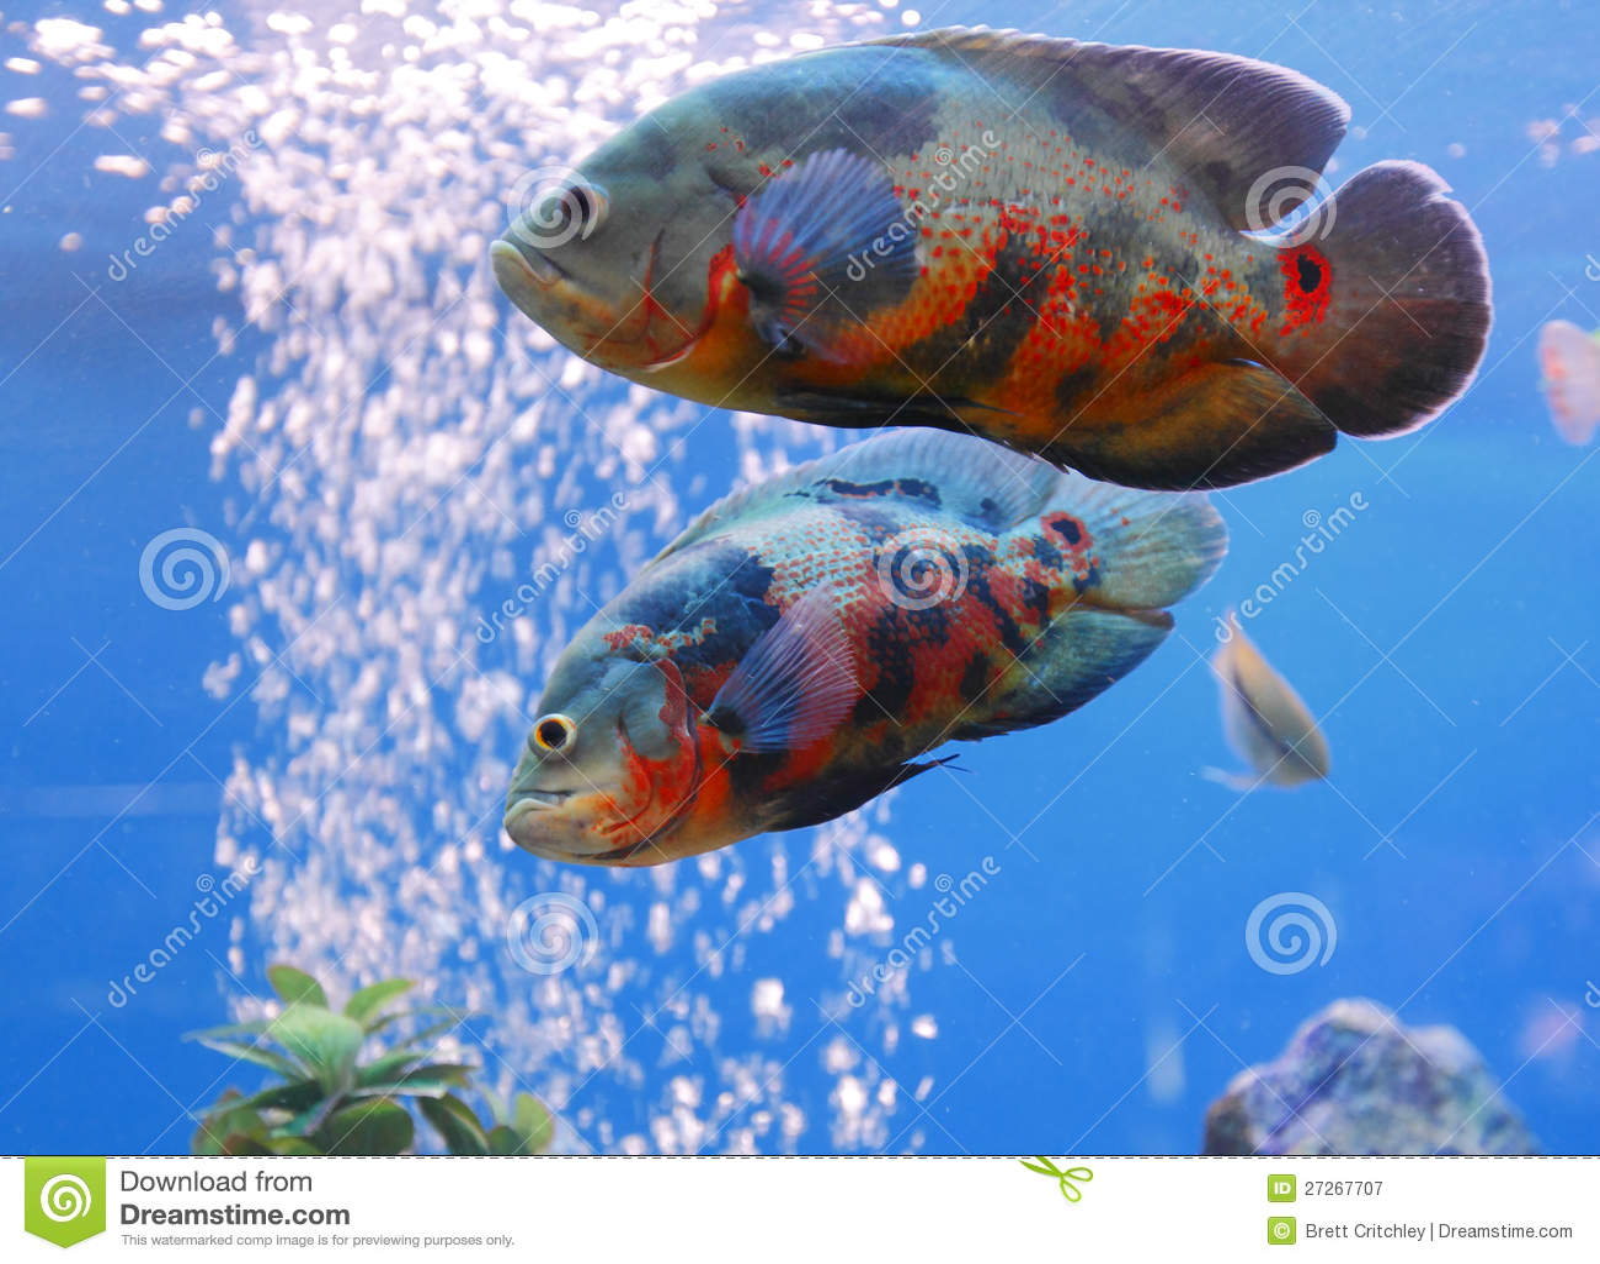 how to feed oscar fish